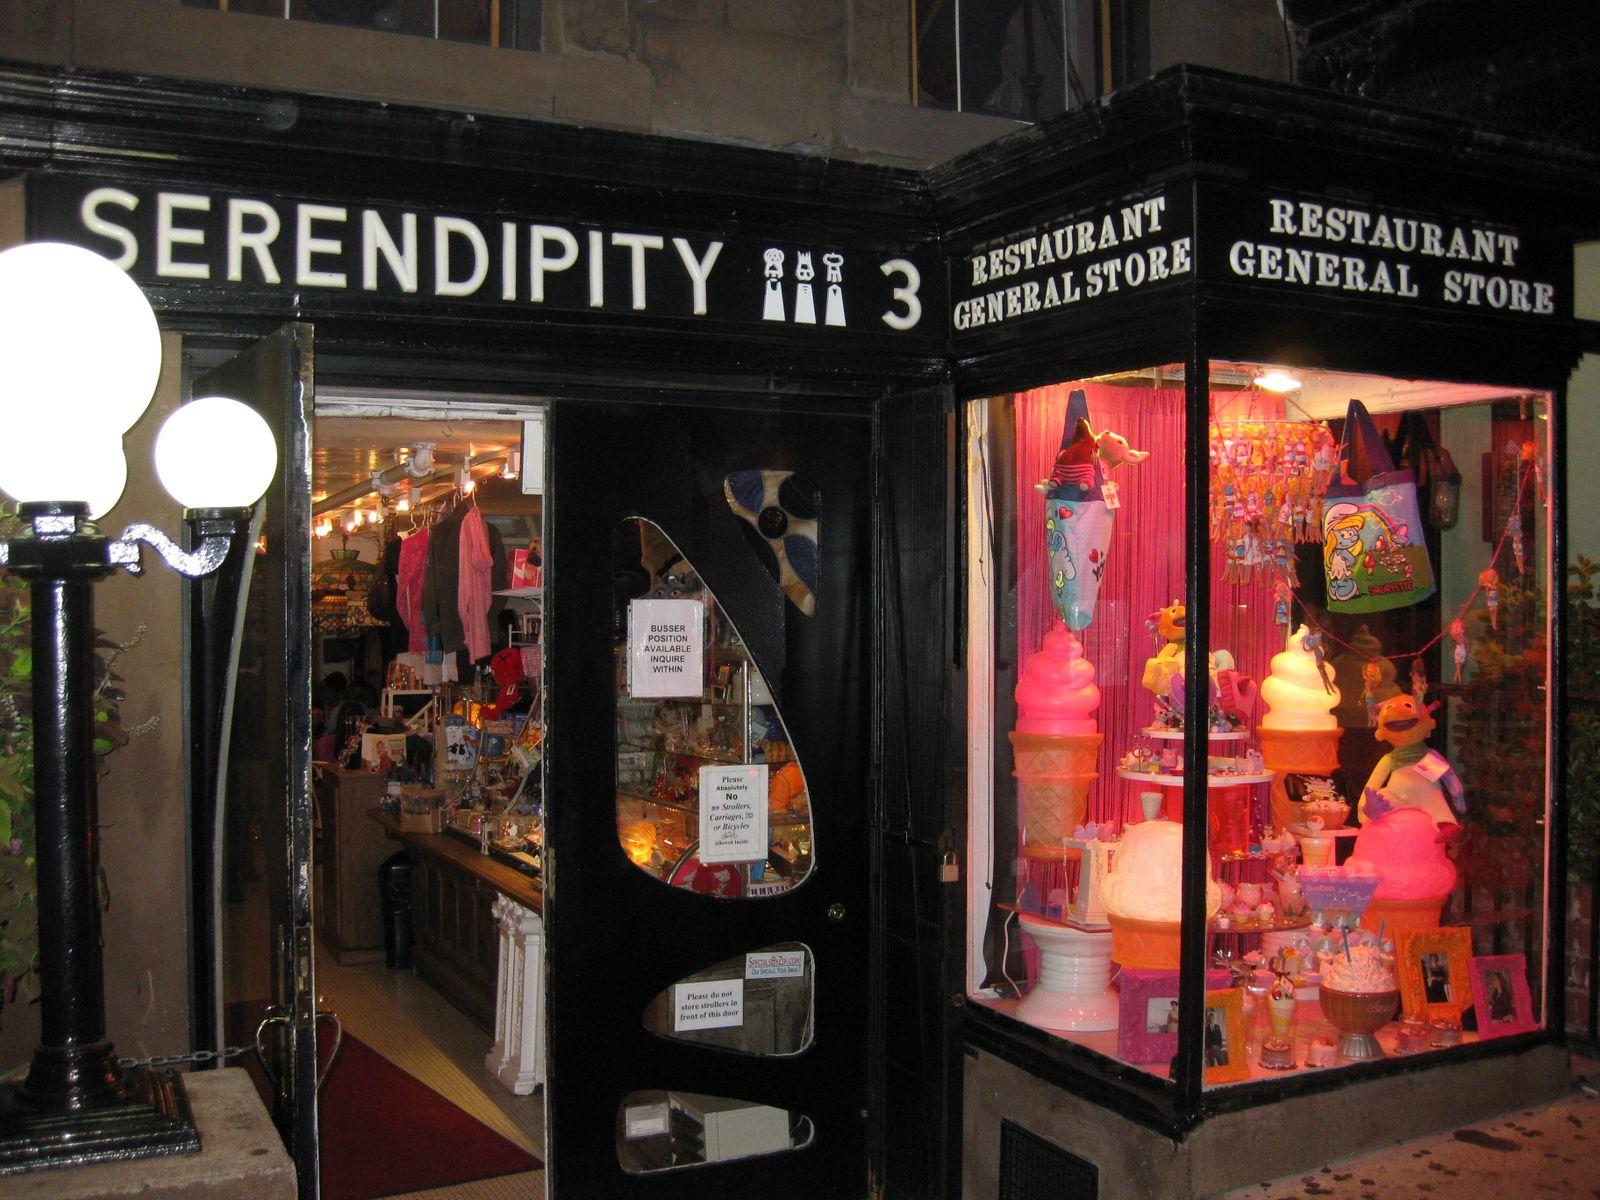 THE SAVVY SHOPPER: Serendipity 3's Frrrozen Hot Chocolate Lite